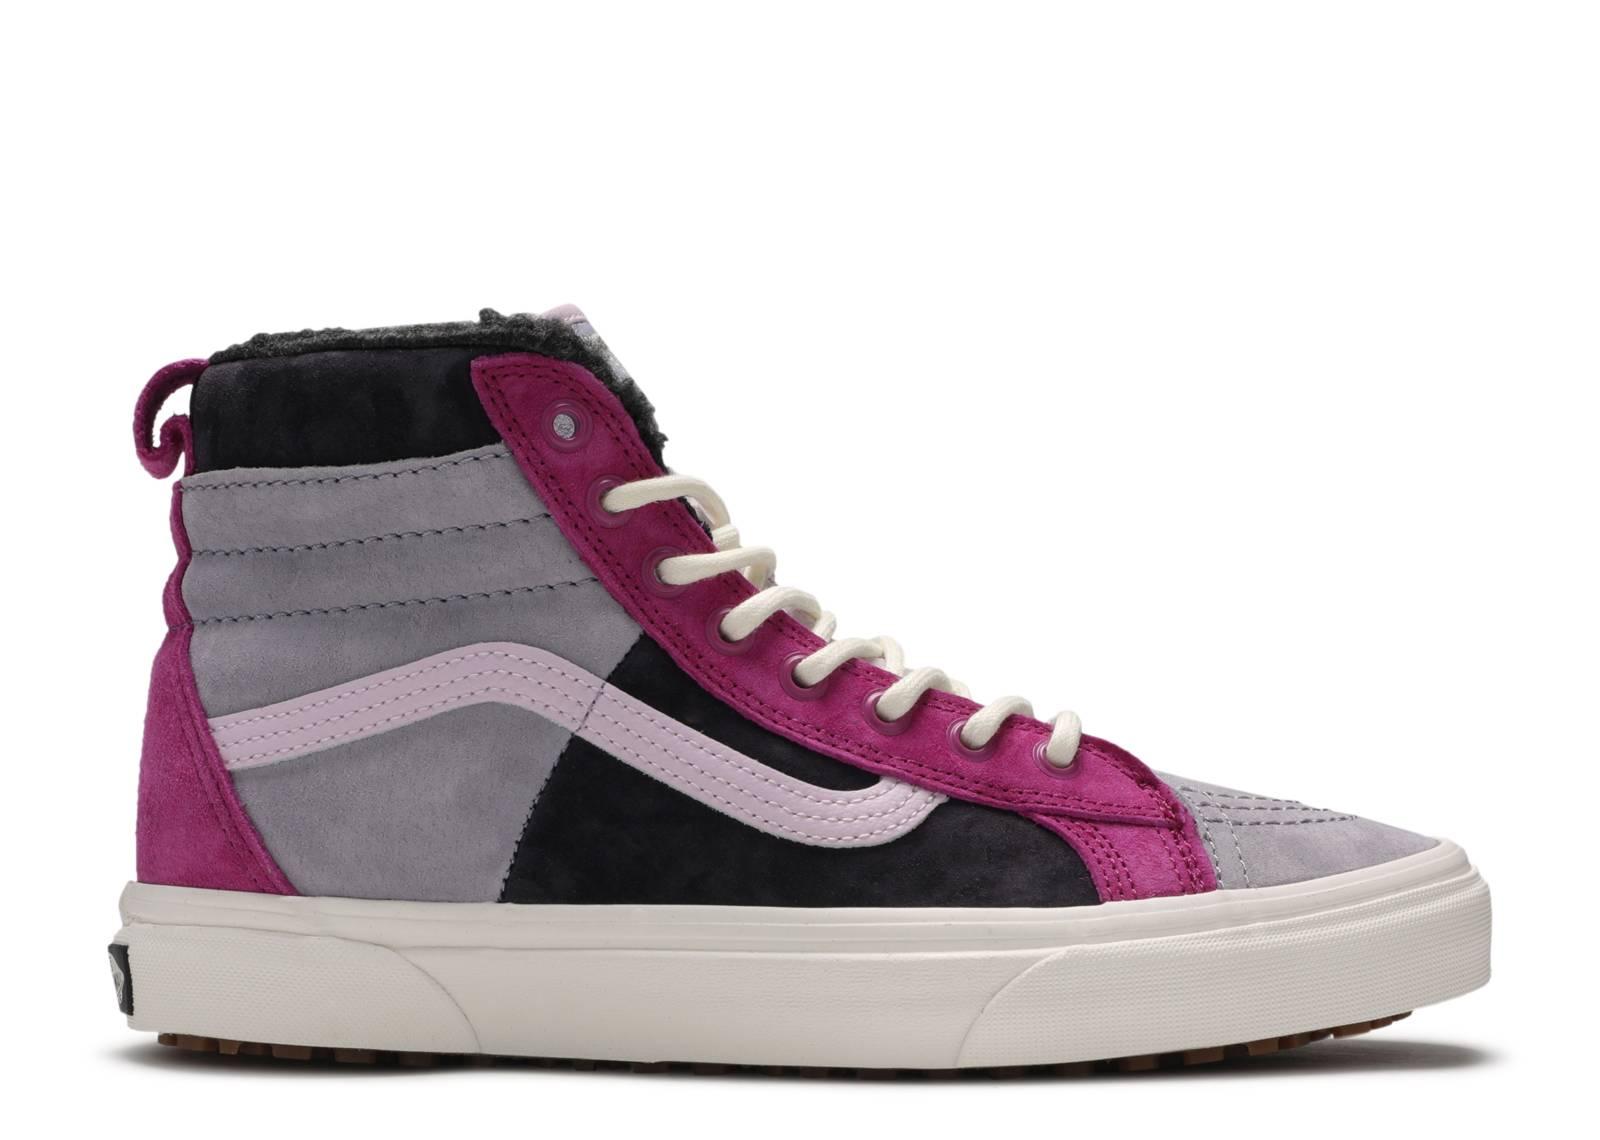 Vans SK8 Hi 46 MTE DX shoes purple pink grey